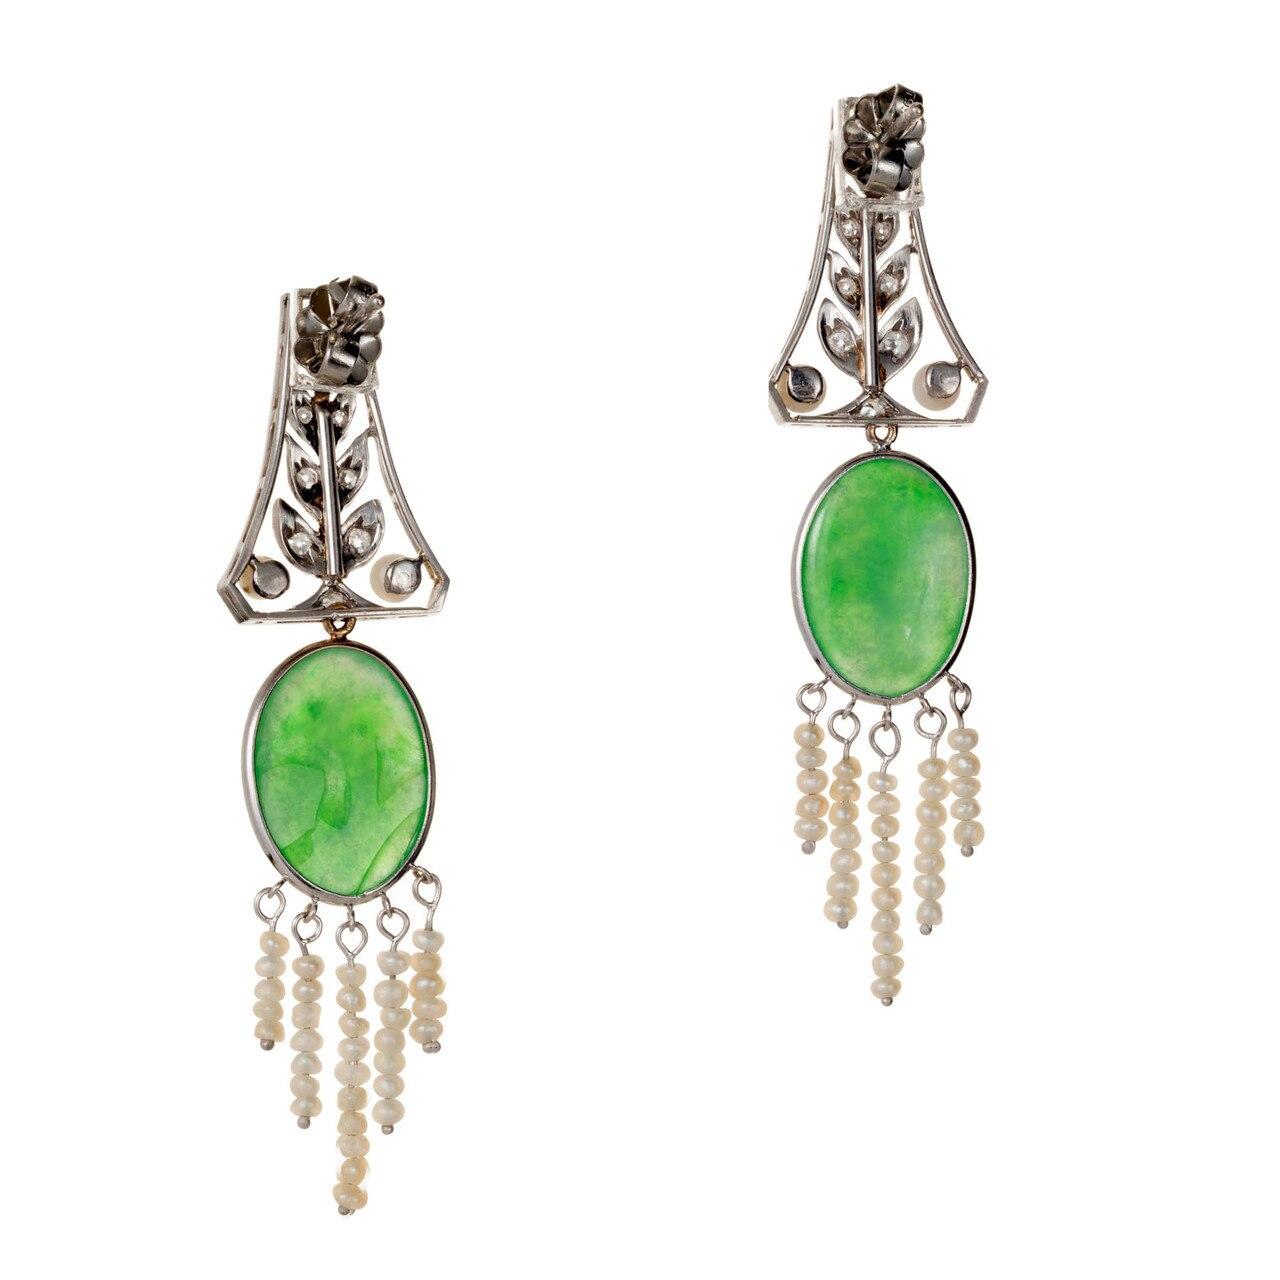 Exciting Jadeite Jade Jewelry